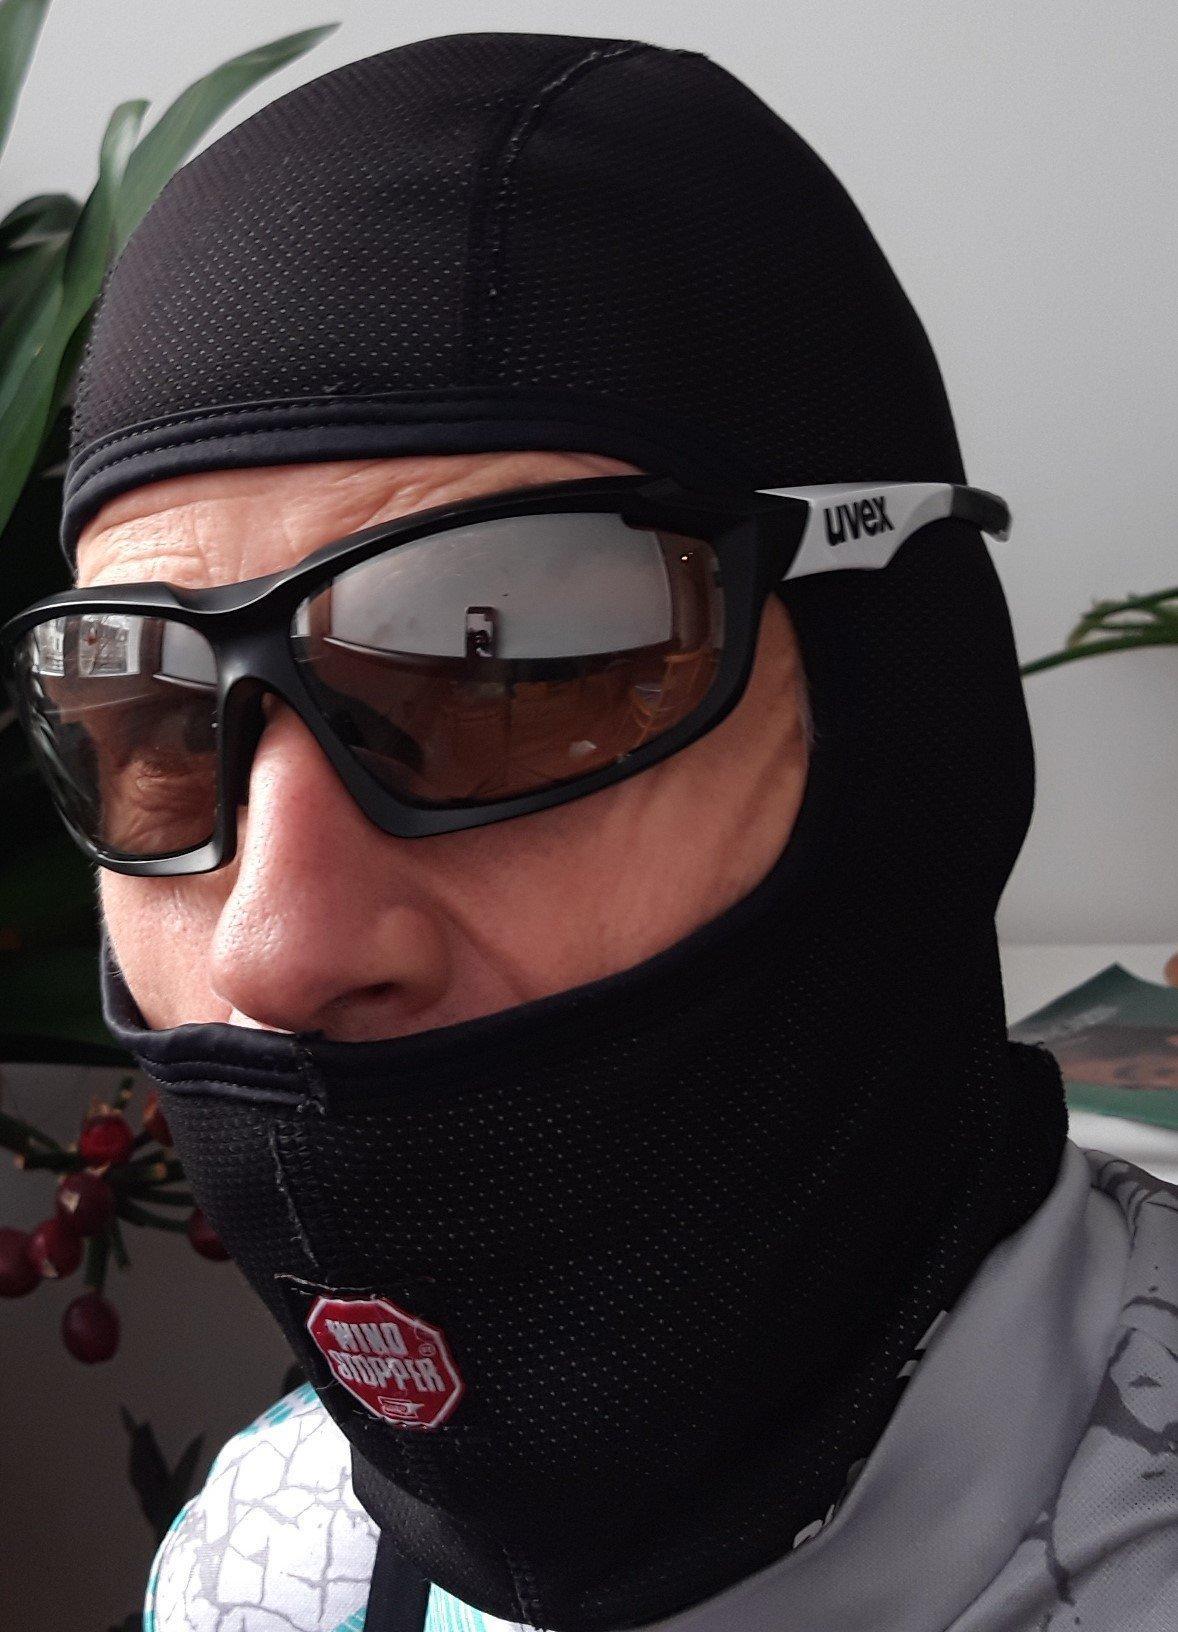 Bebrillter Radfahrer mit Sturmhaube über dem Kopf